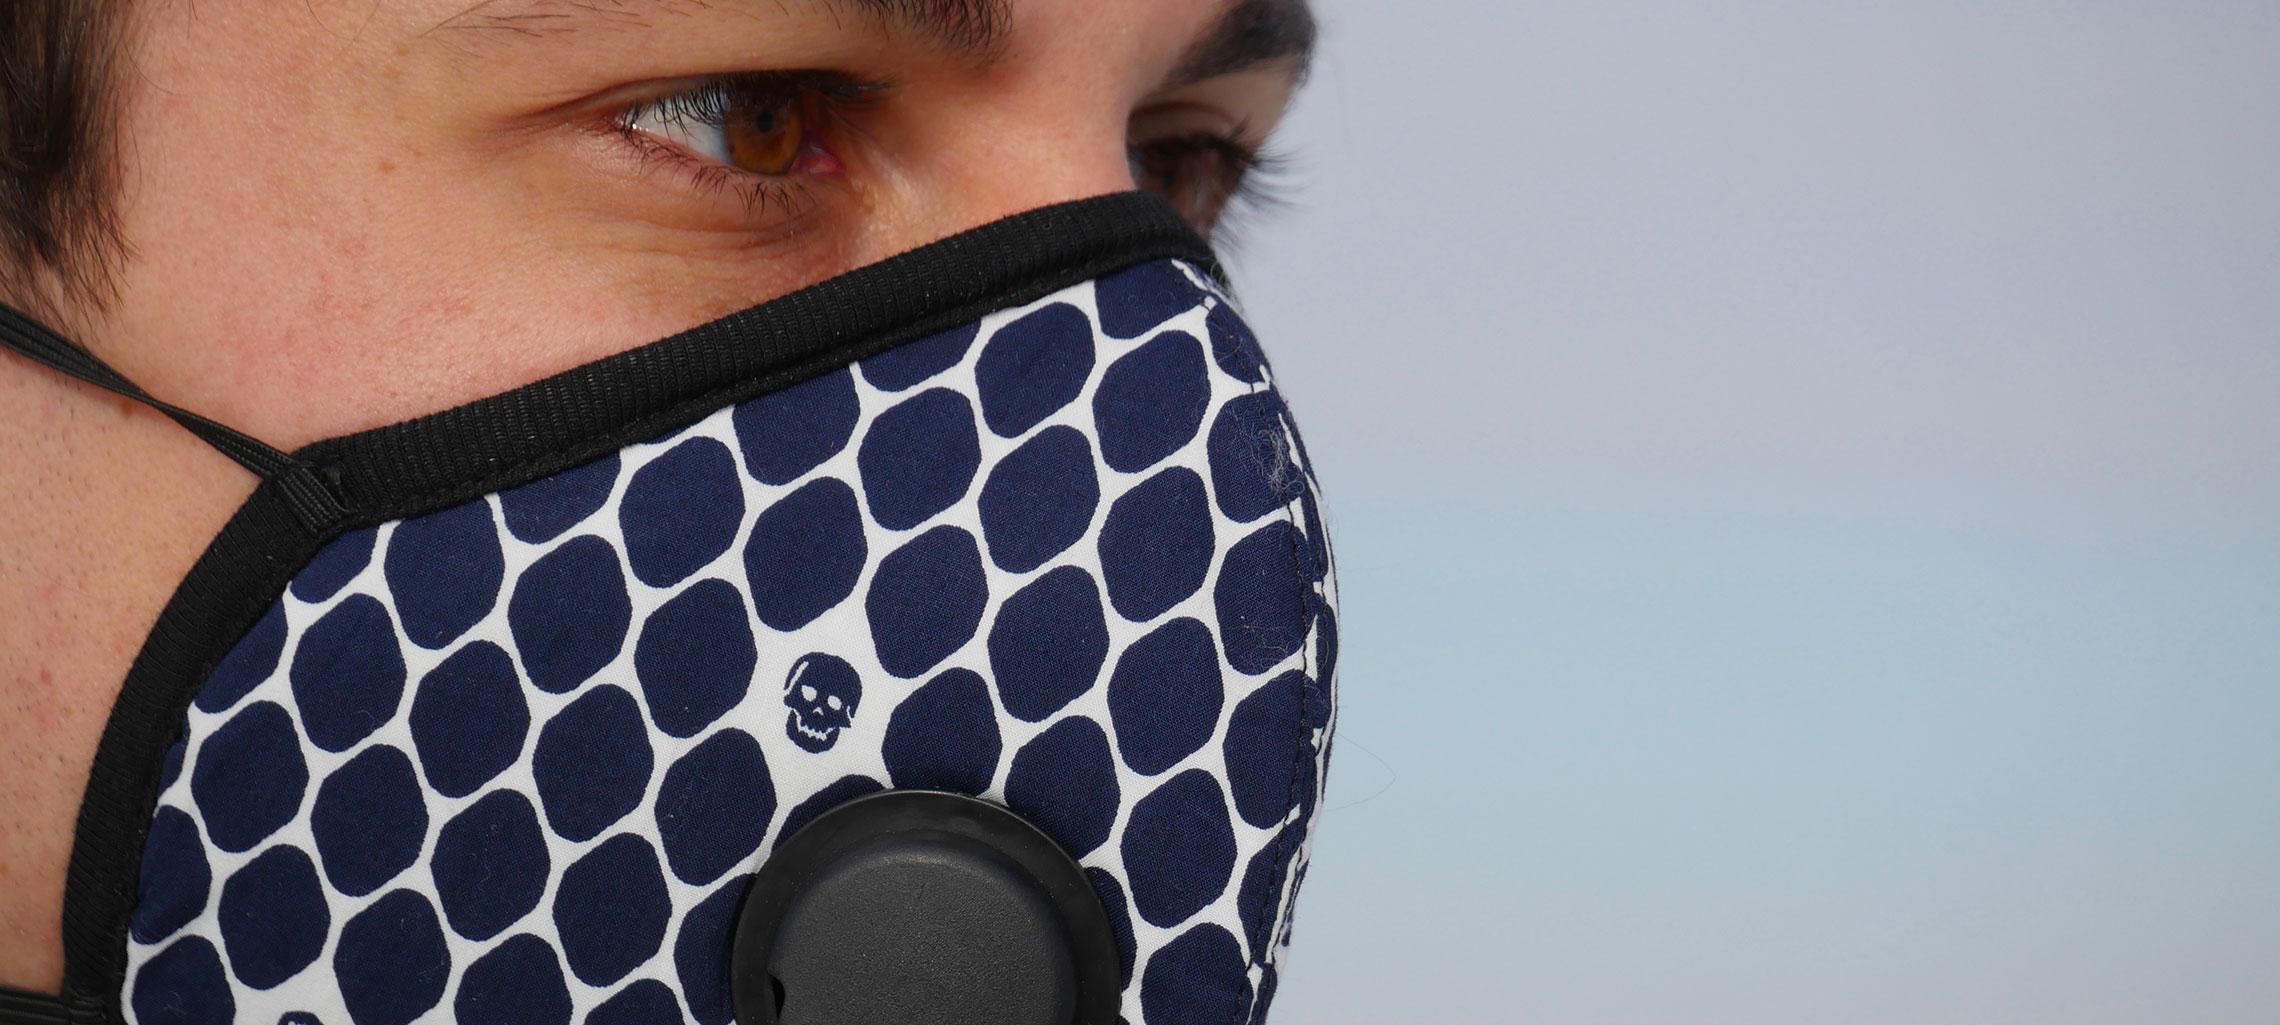 Blossum Mask anti-pollution